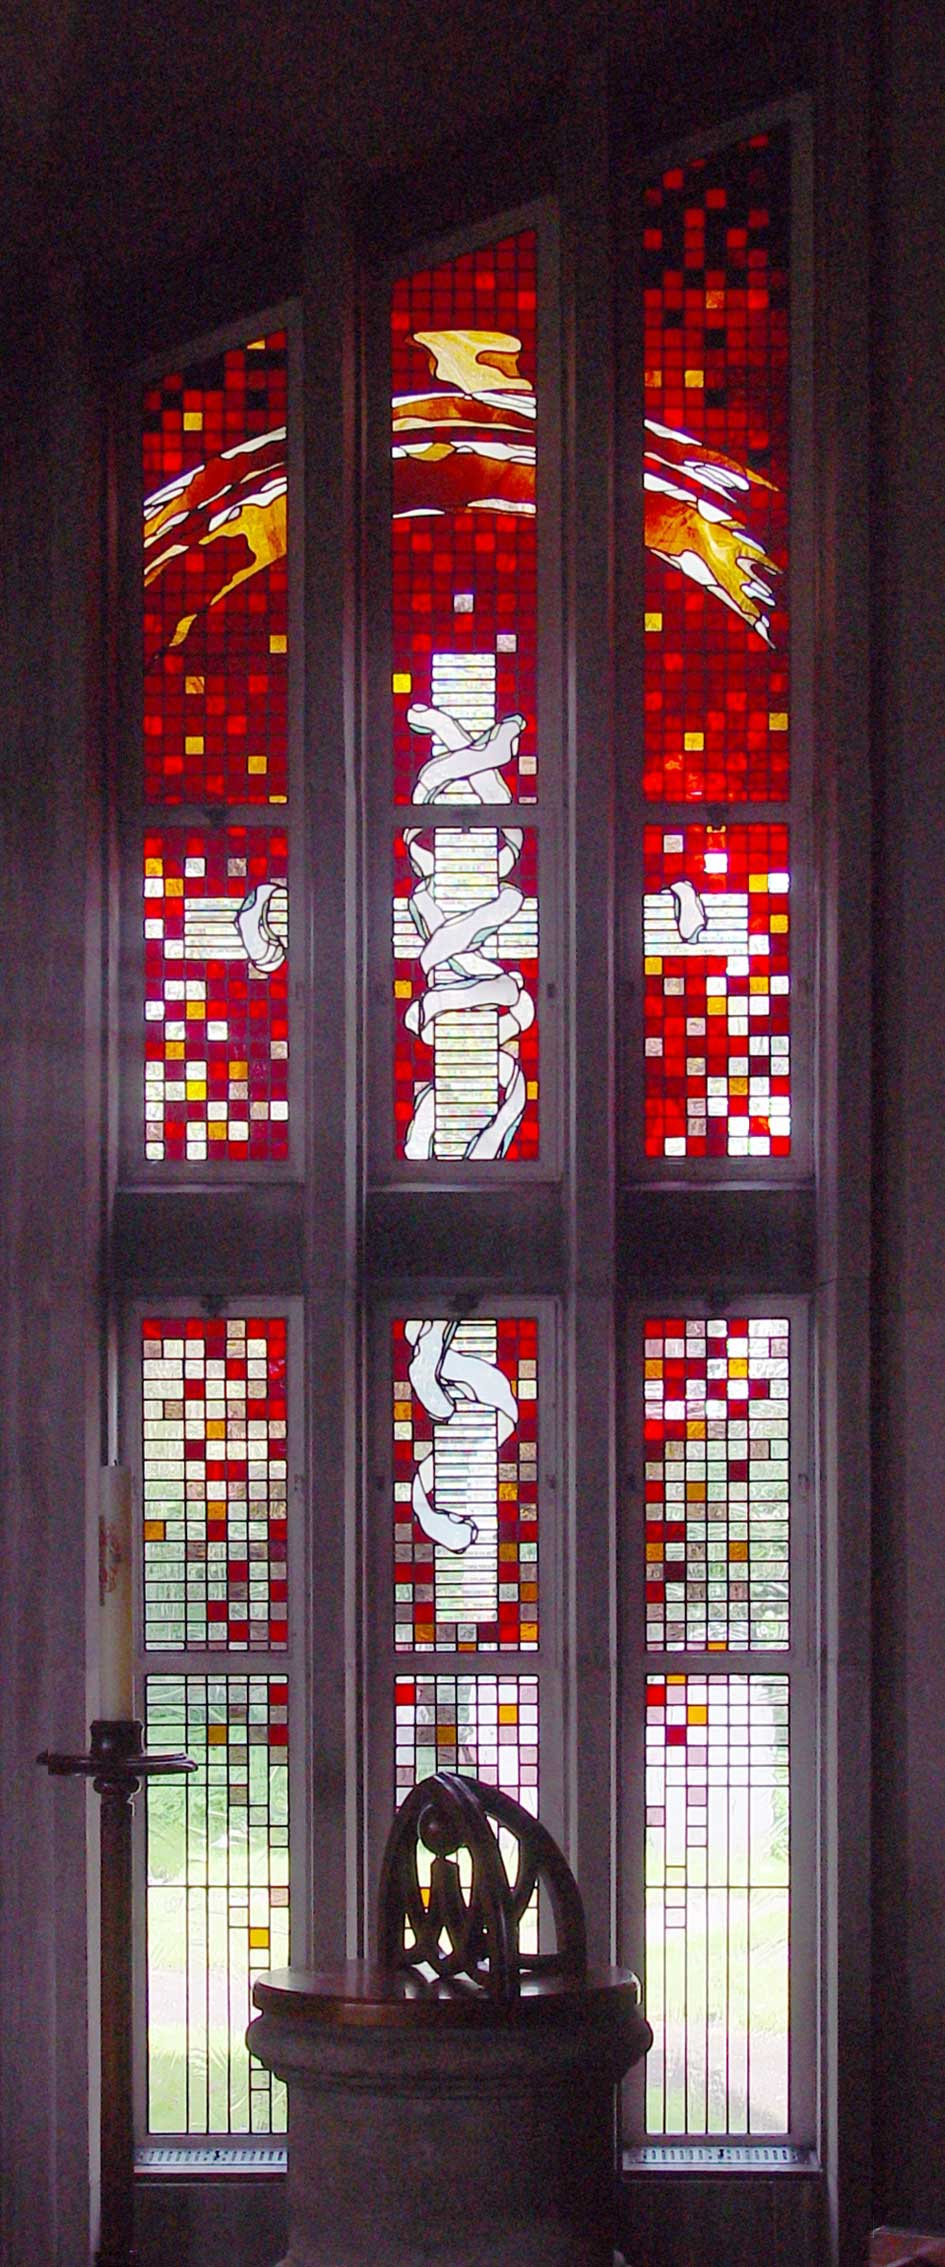 St. James Church, Birstall.